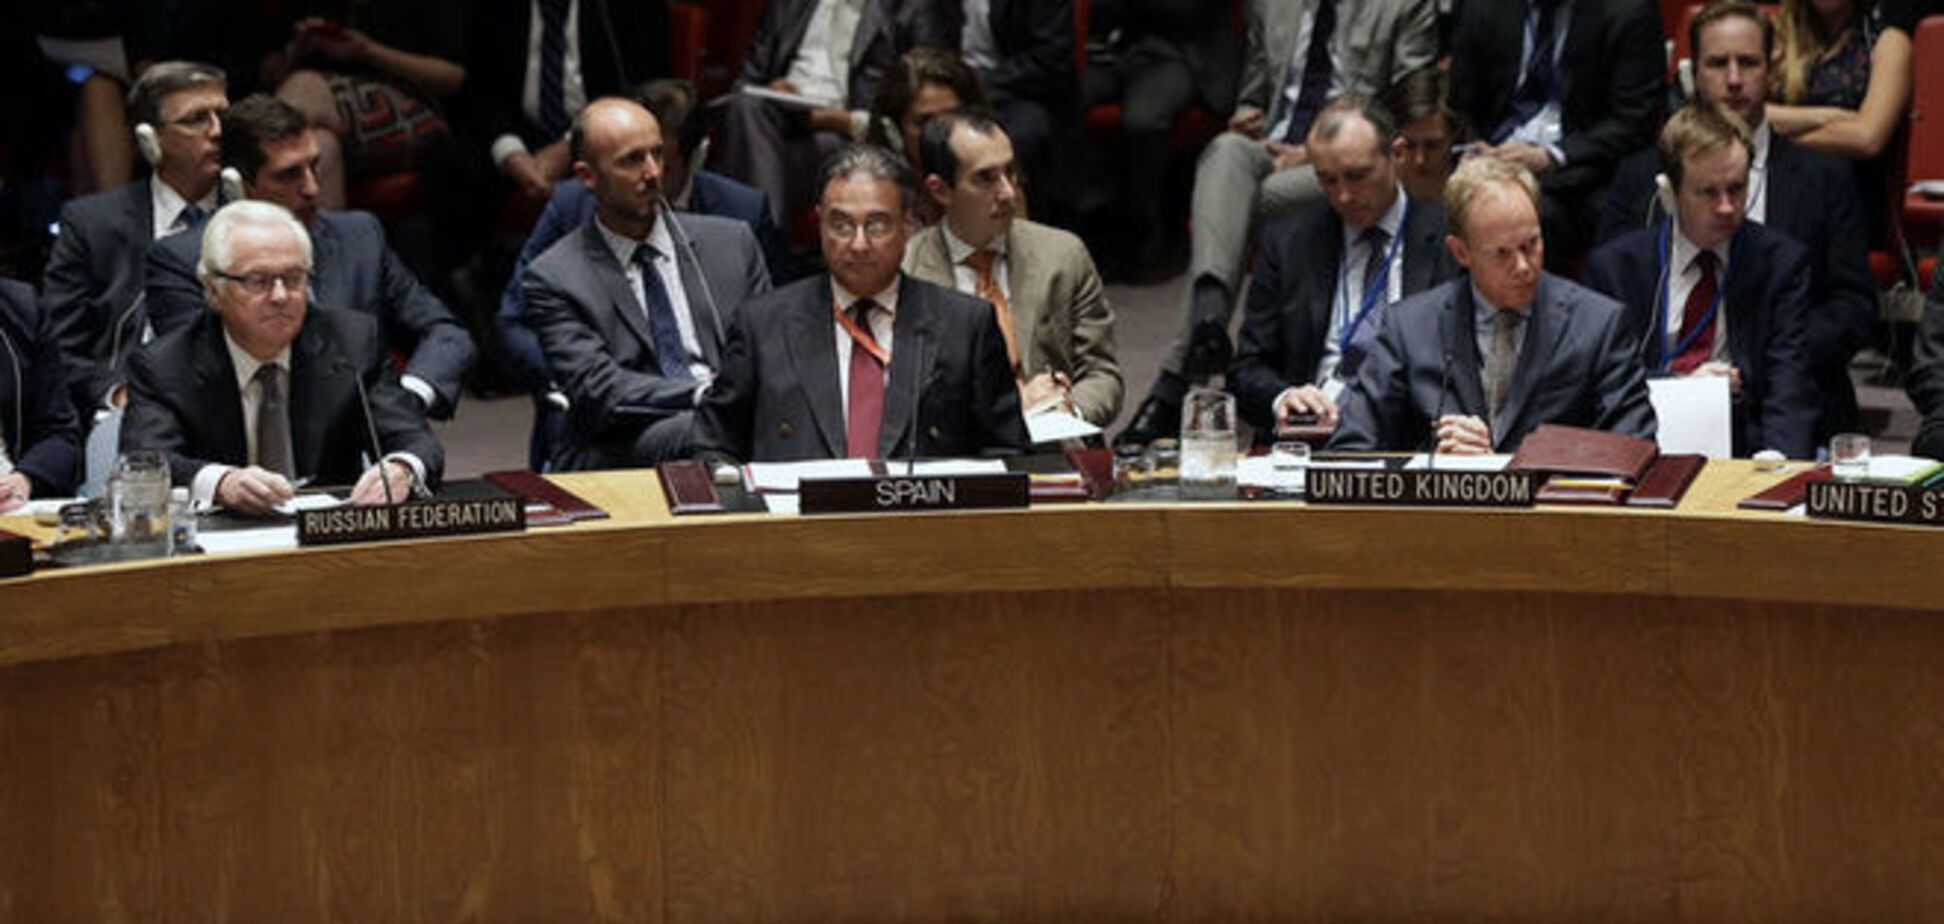 Соцсети о заседании Совбеза ООН по 'Боингу': вина России очевидна даже дебилу